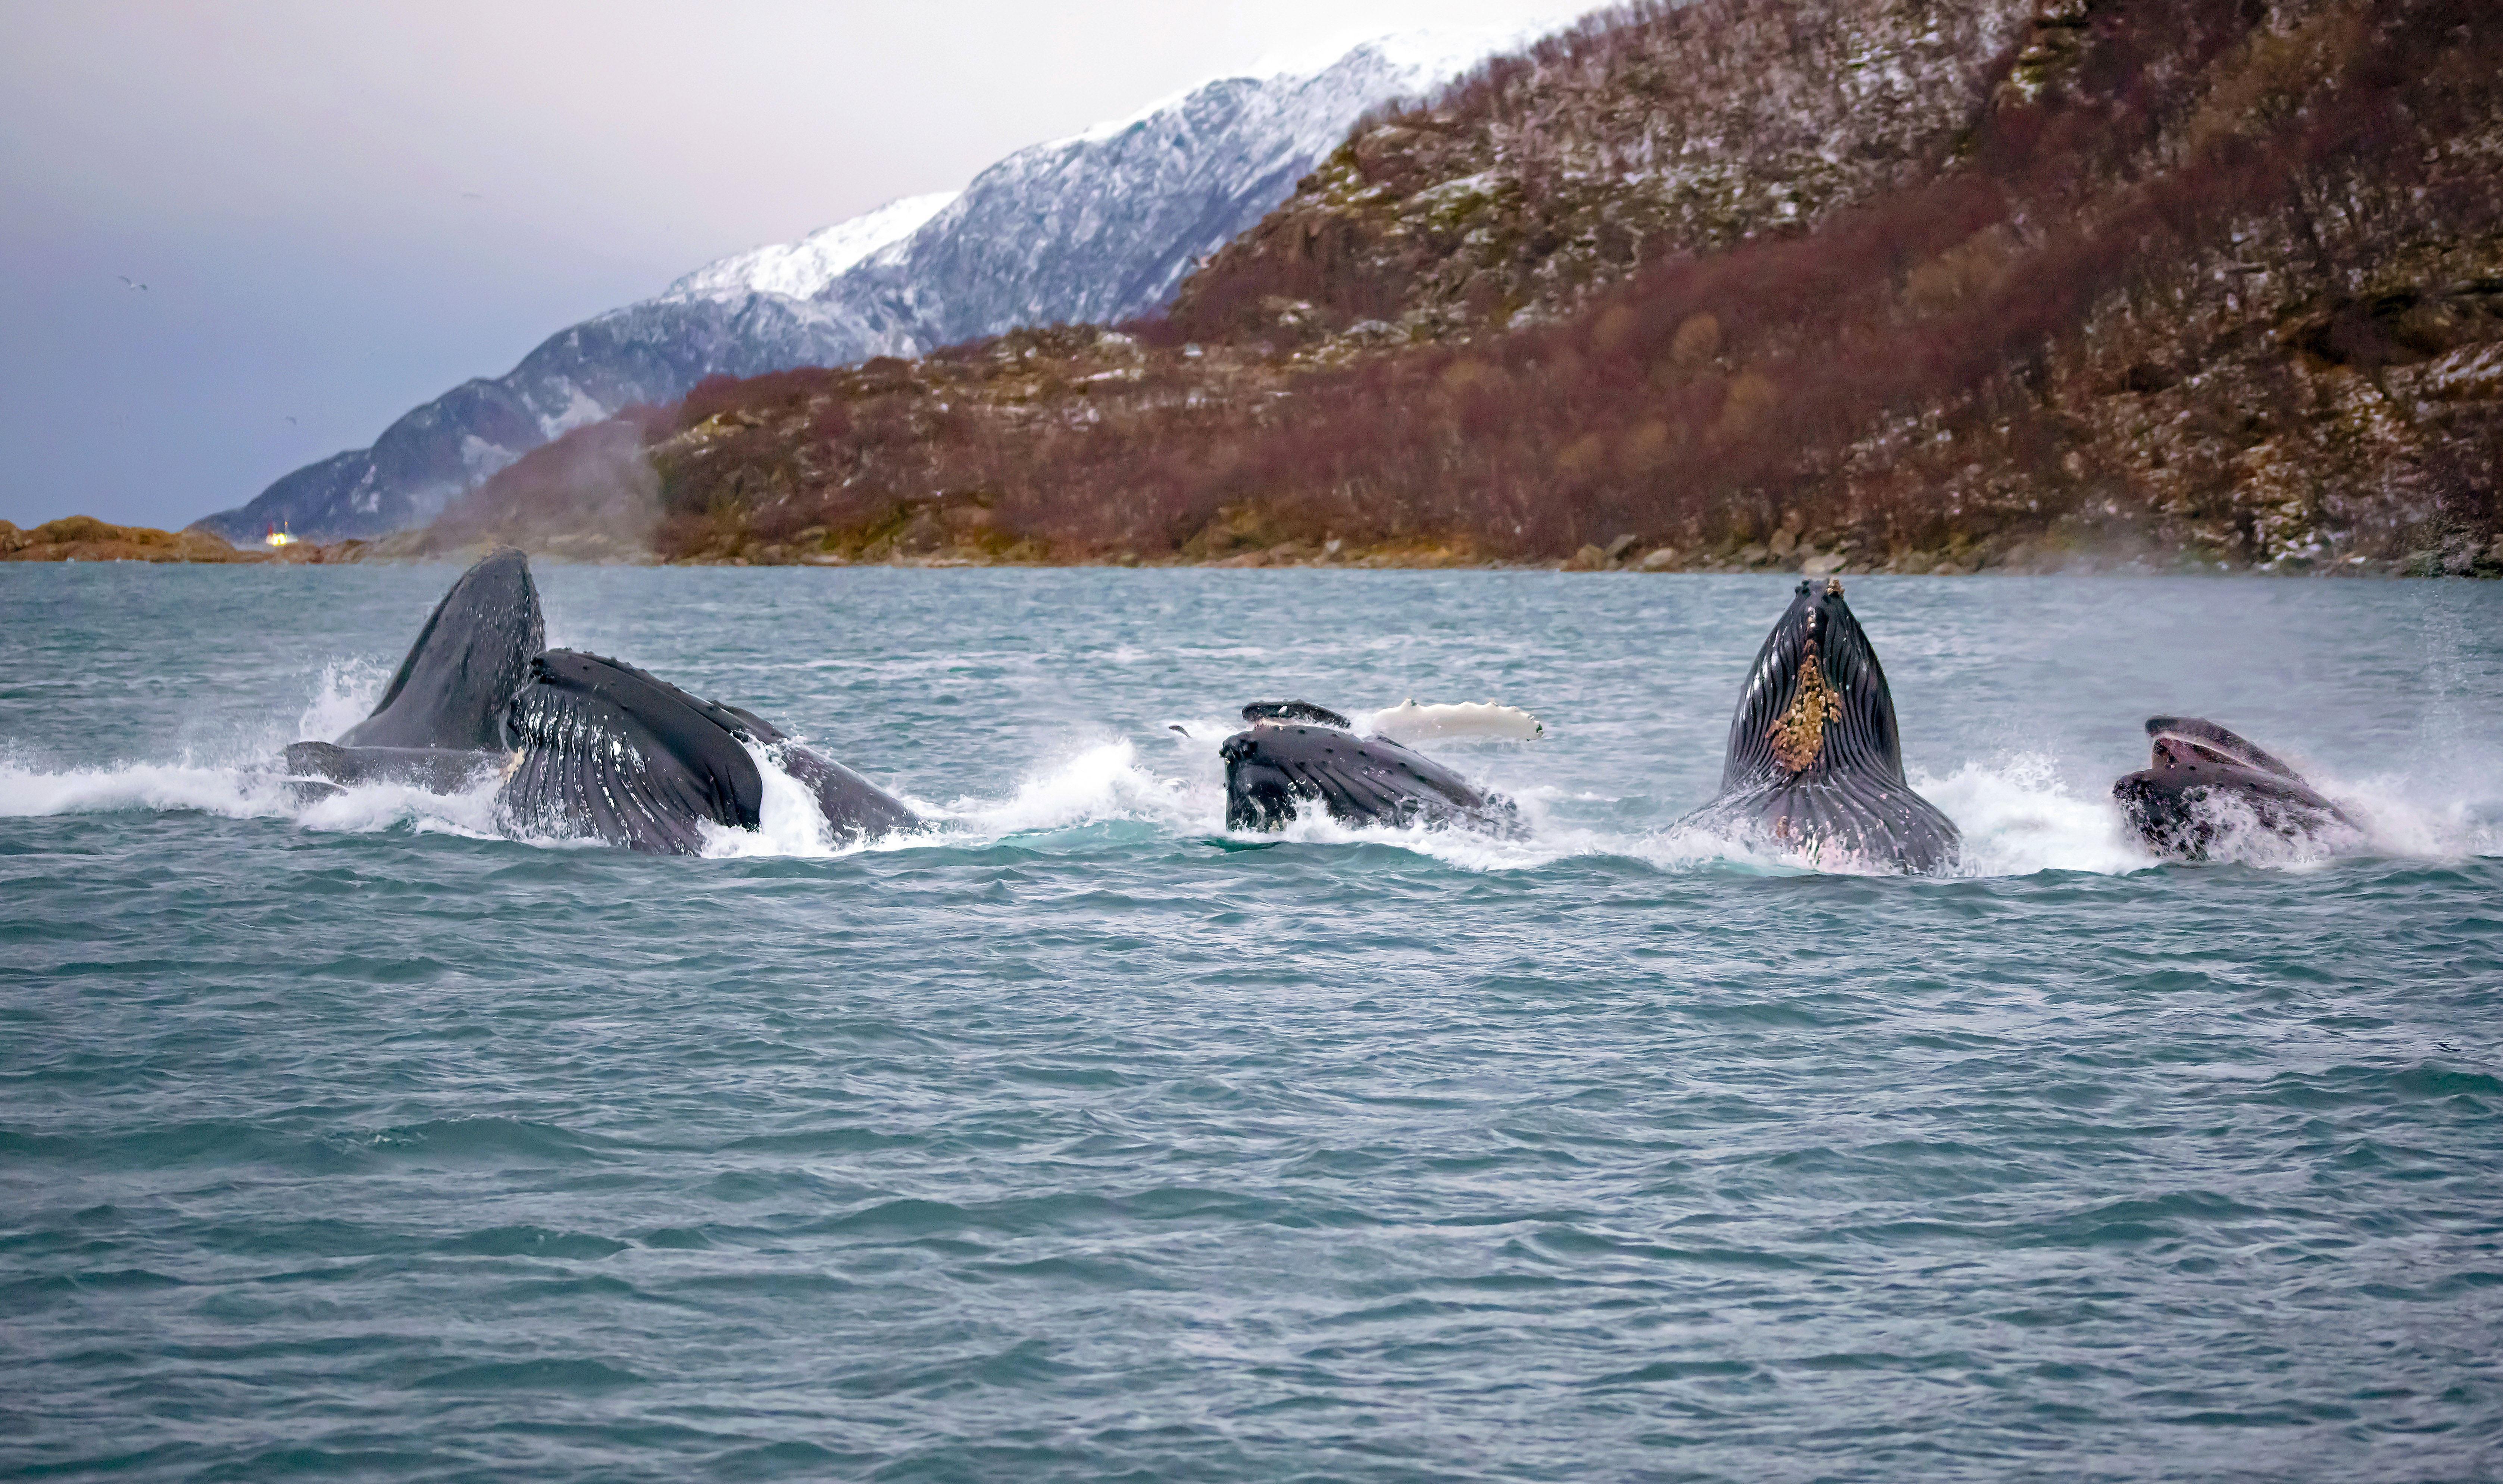 Arctic Whale and Wildlife Safari - Arctic Whale Tours